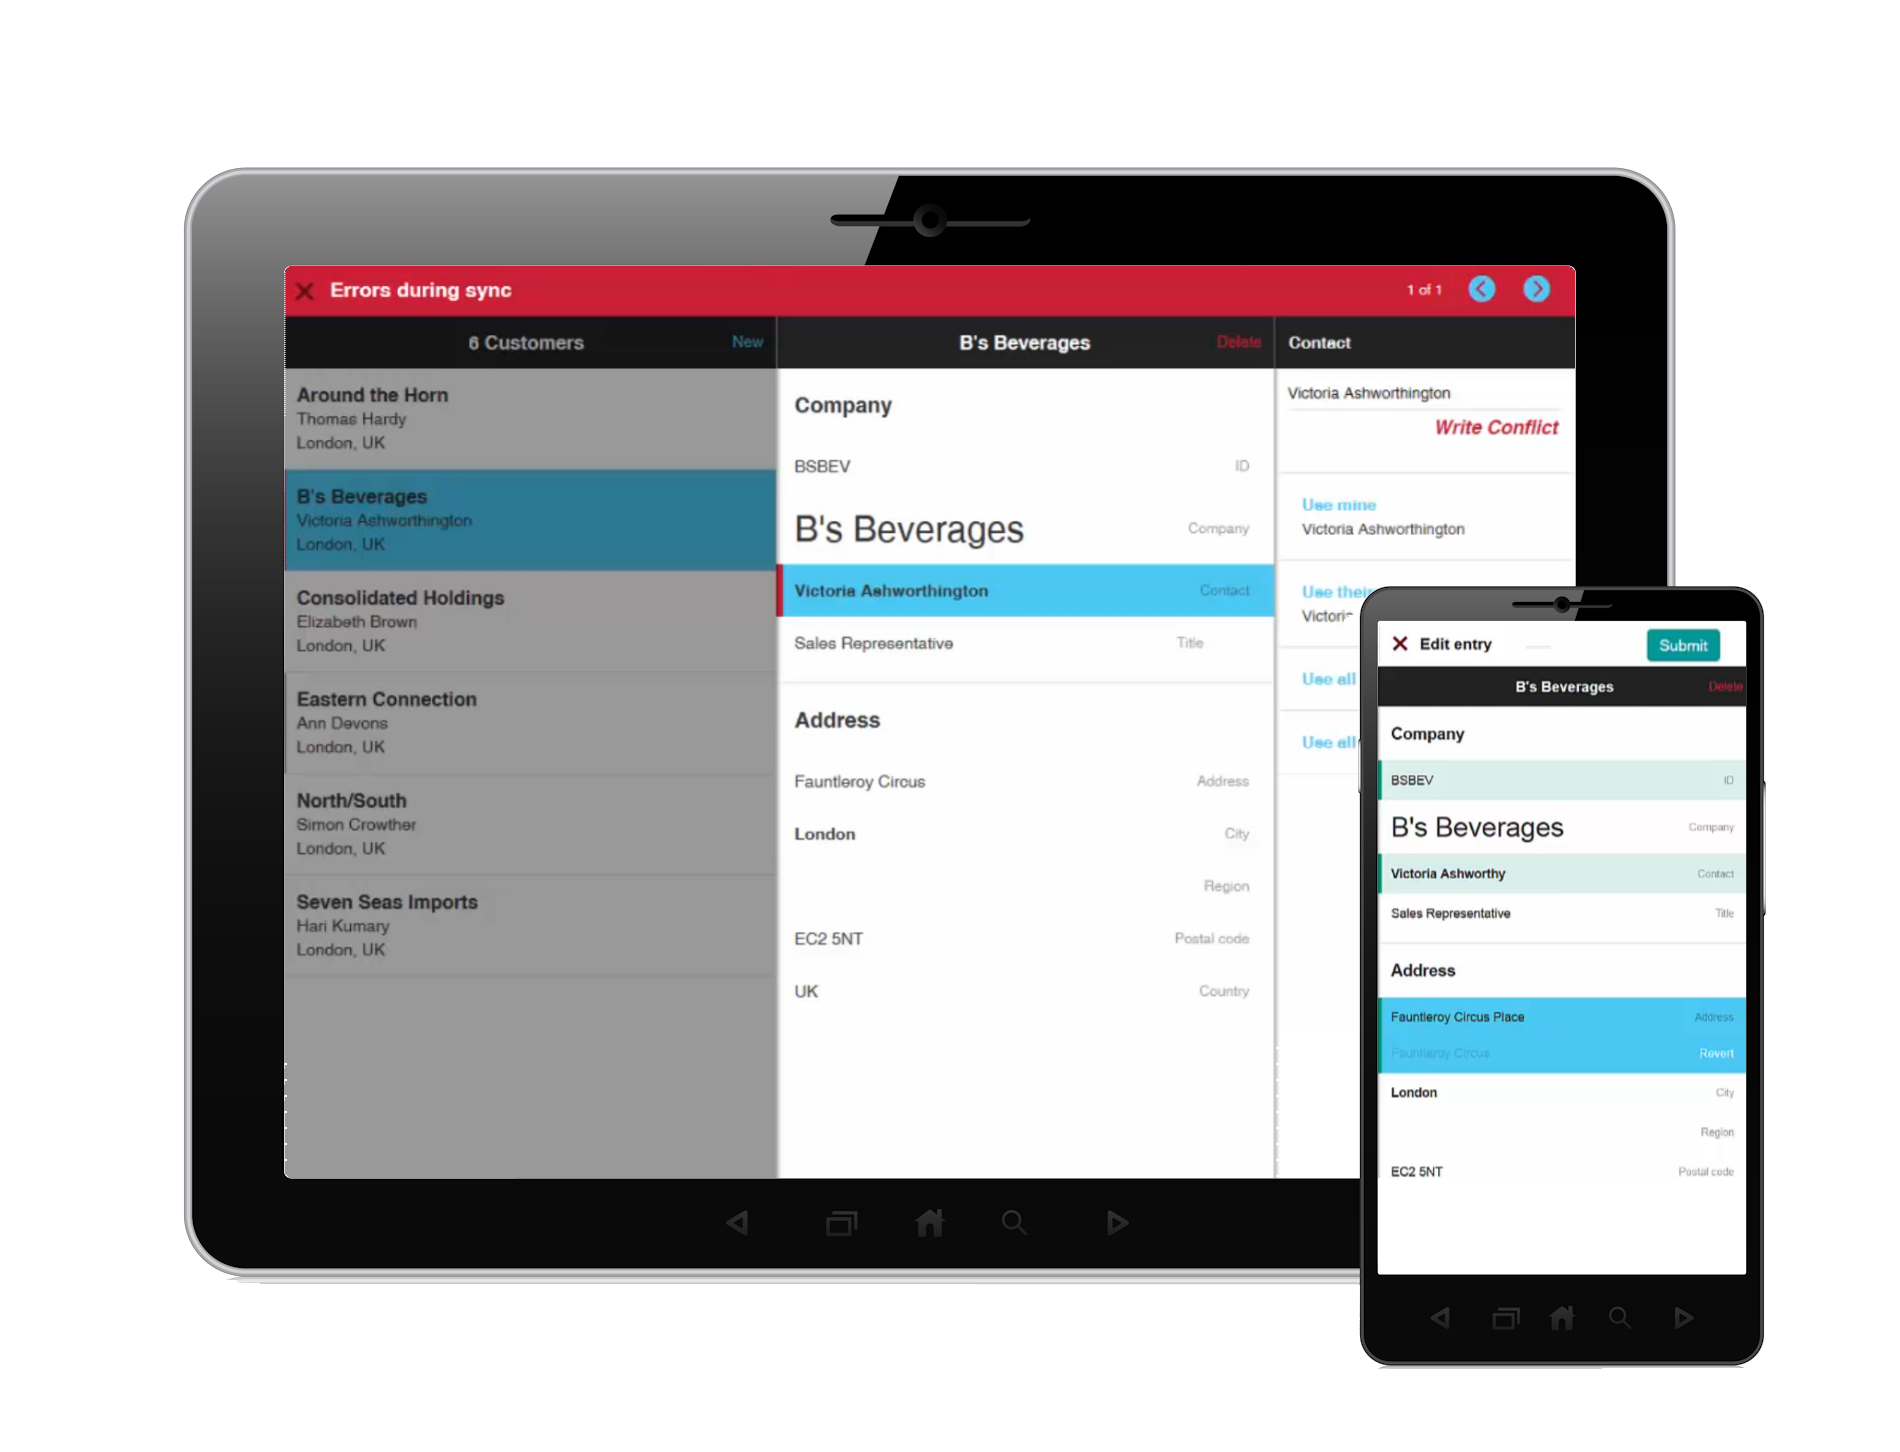 BYOD mobile app business development platform